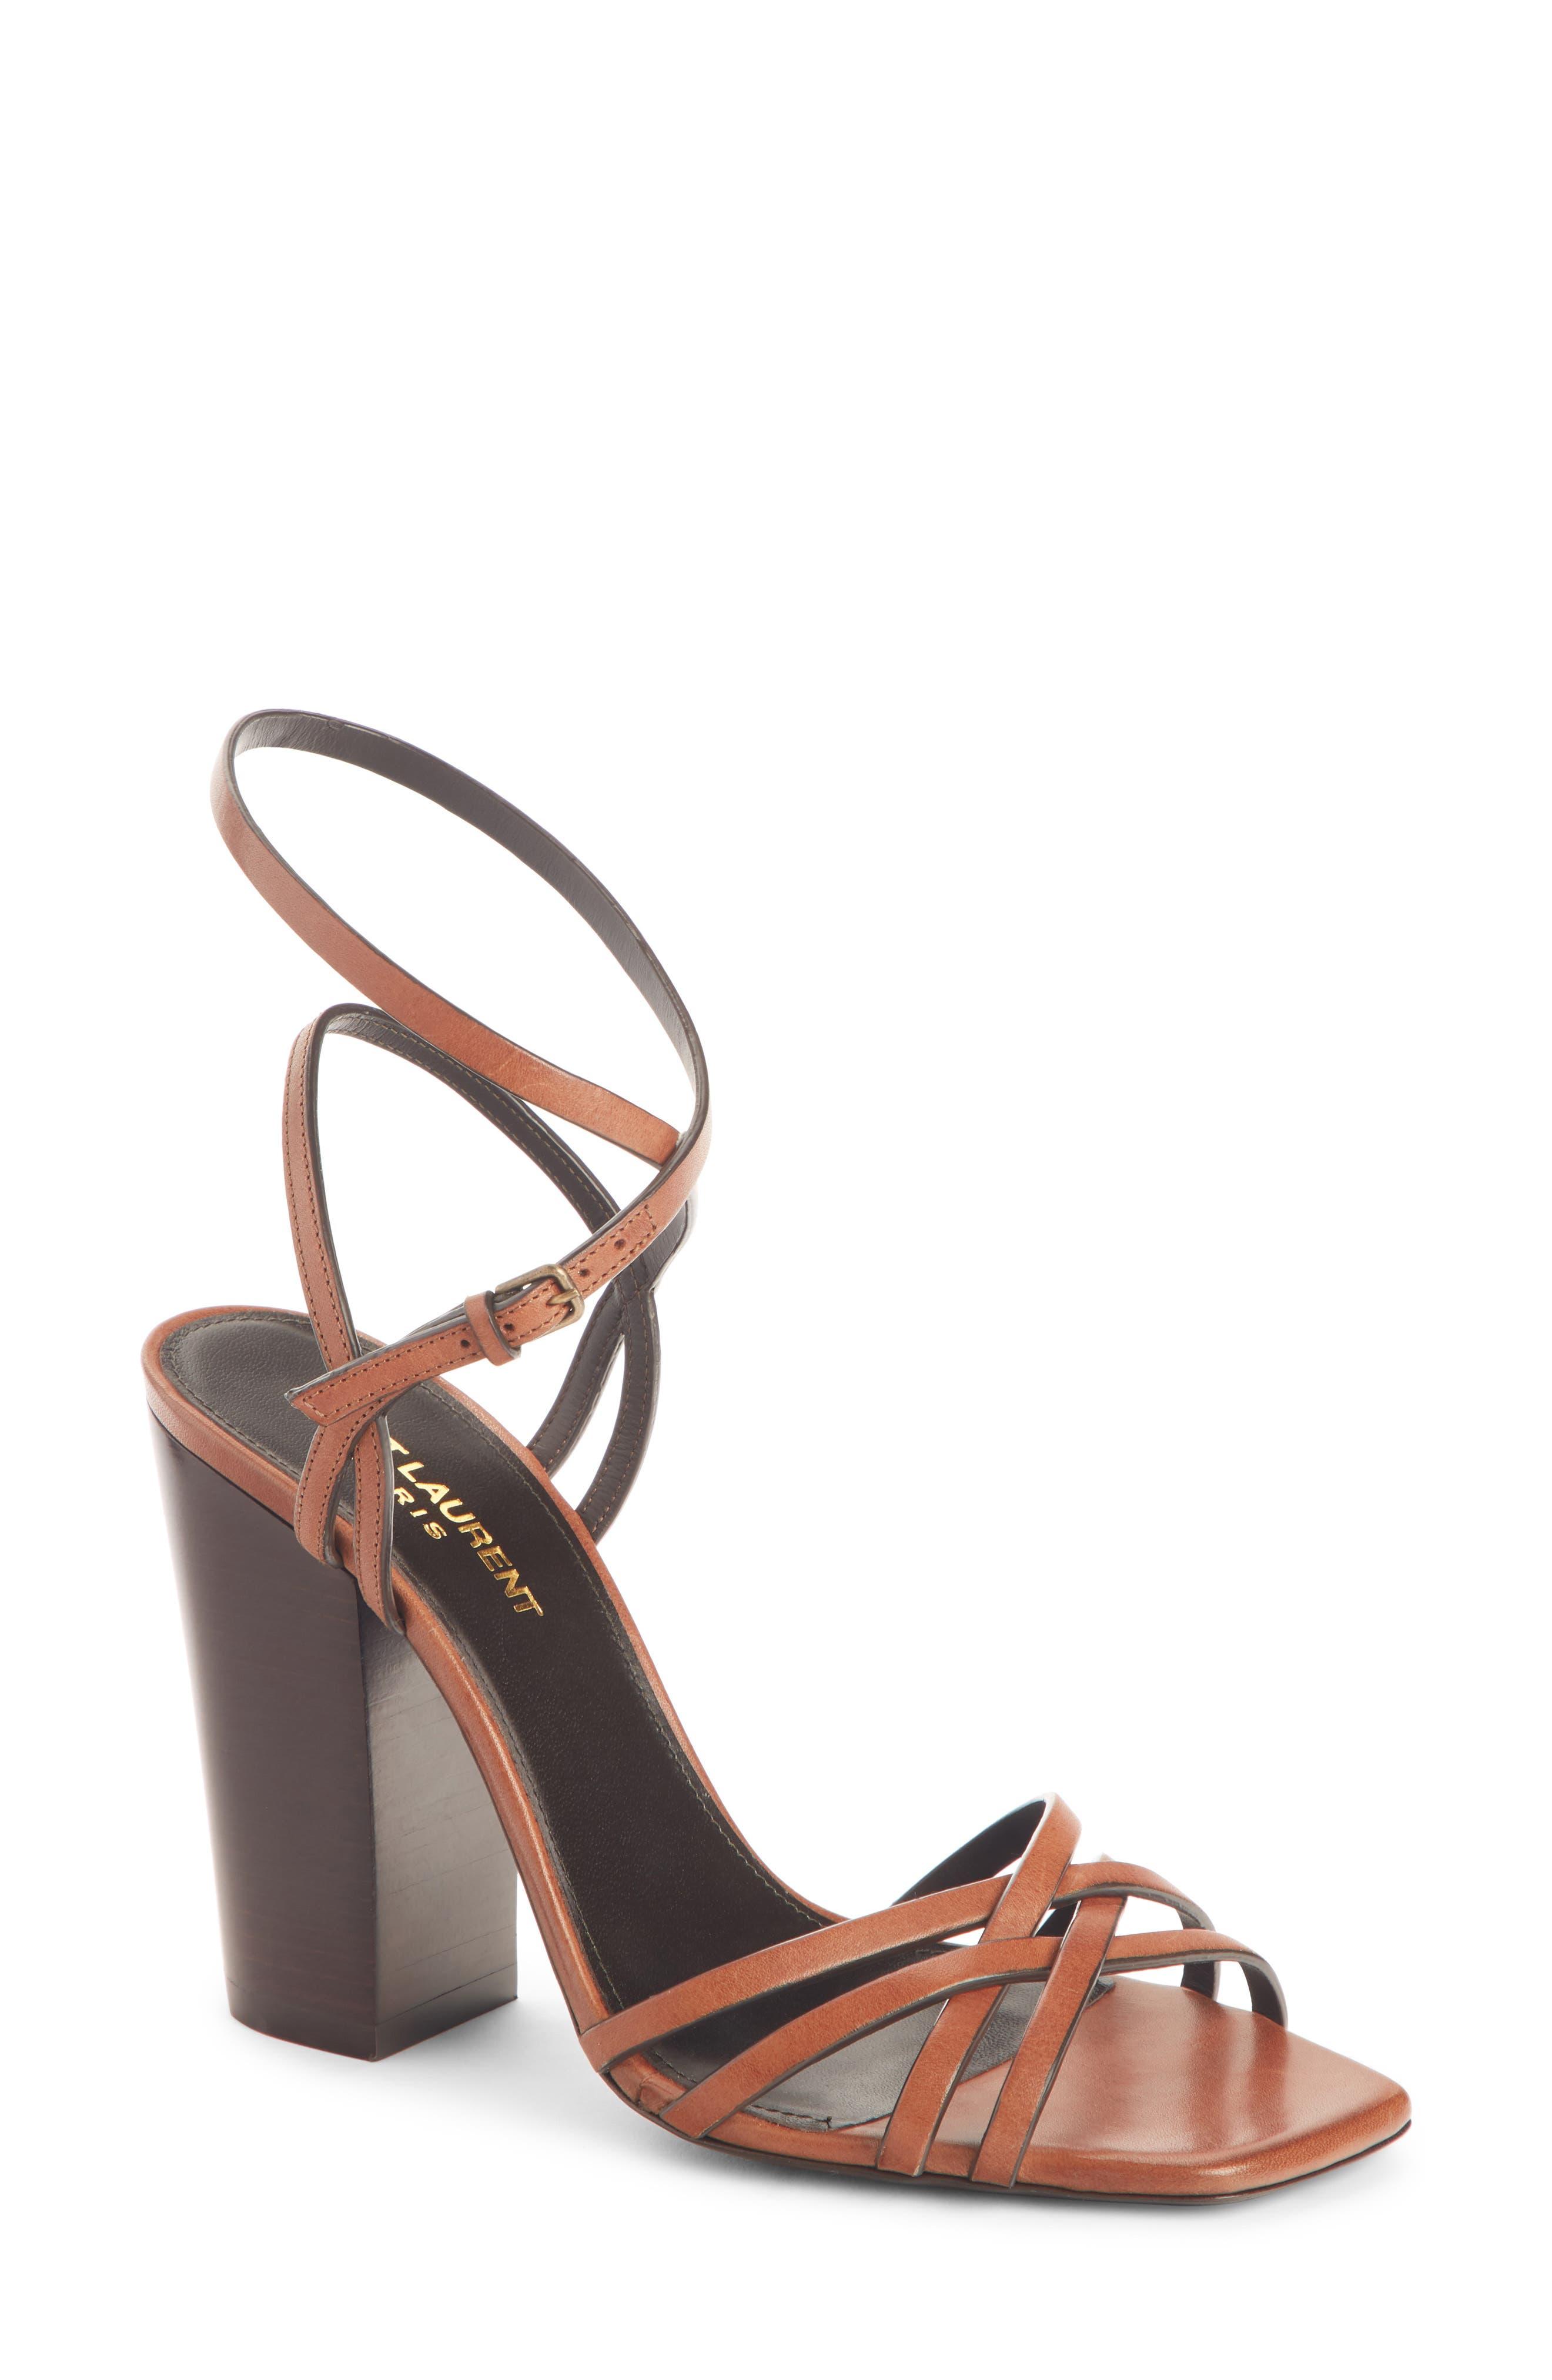 Saint Laurent Oak Crisscross Sandal, Brown